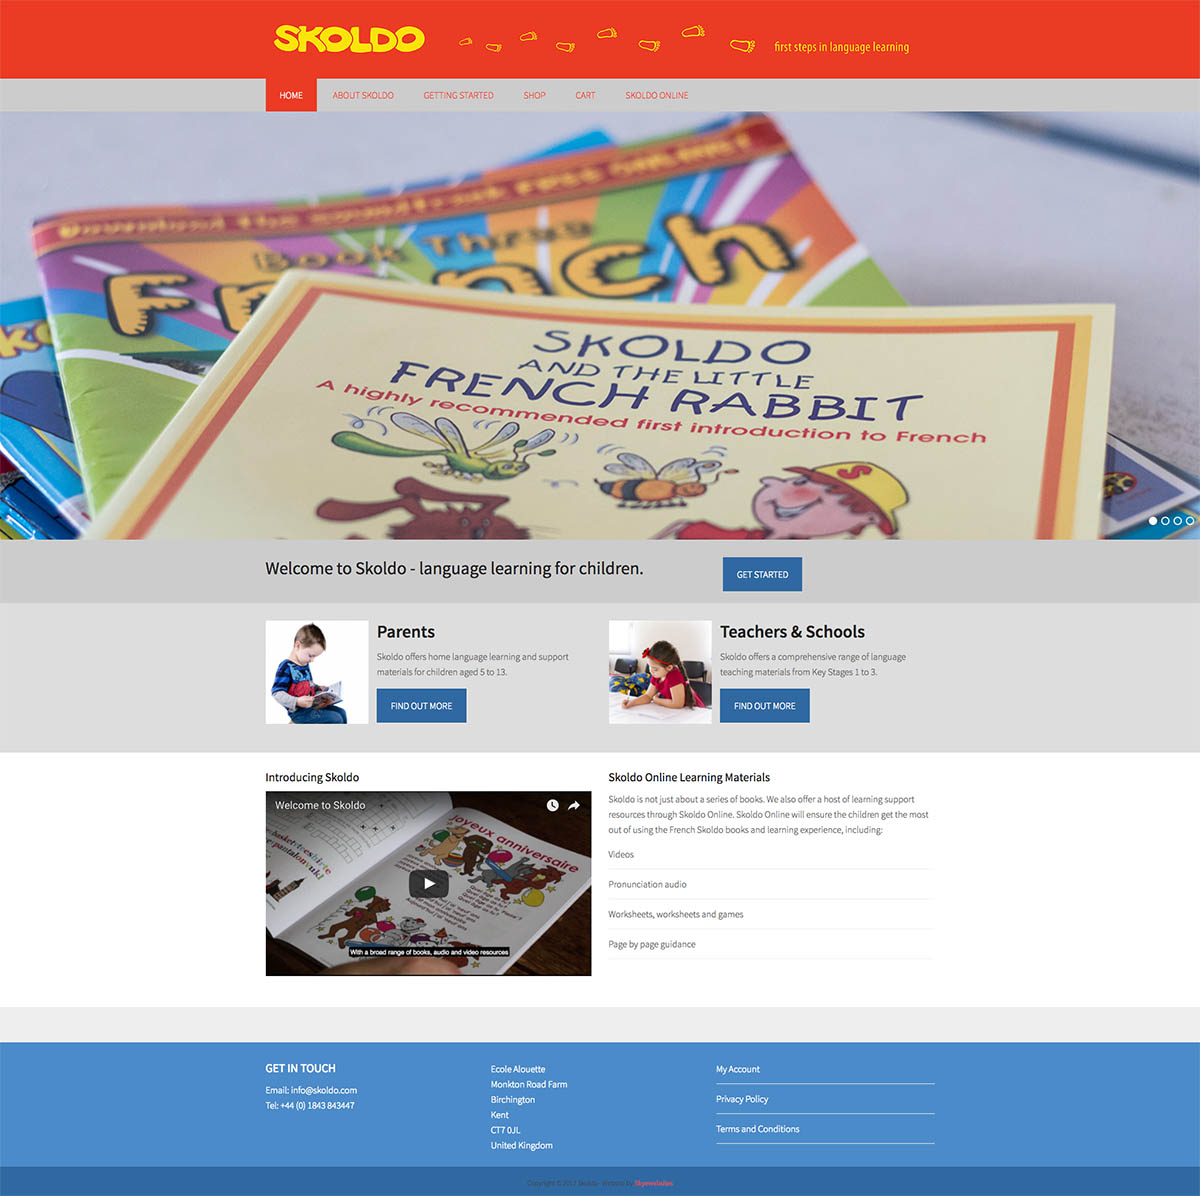 Skyewebsites Skoldo Home Page